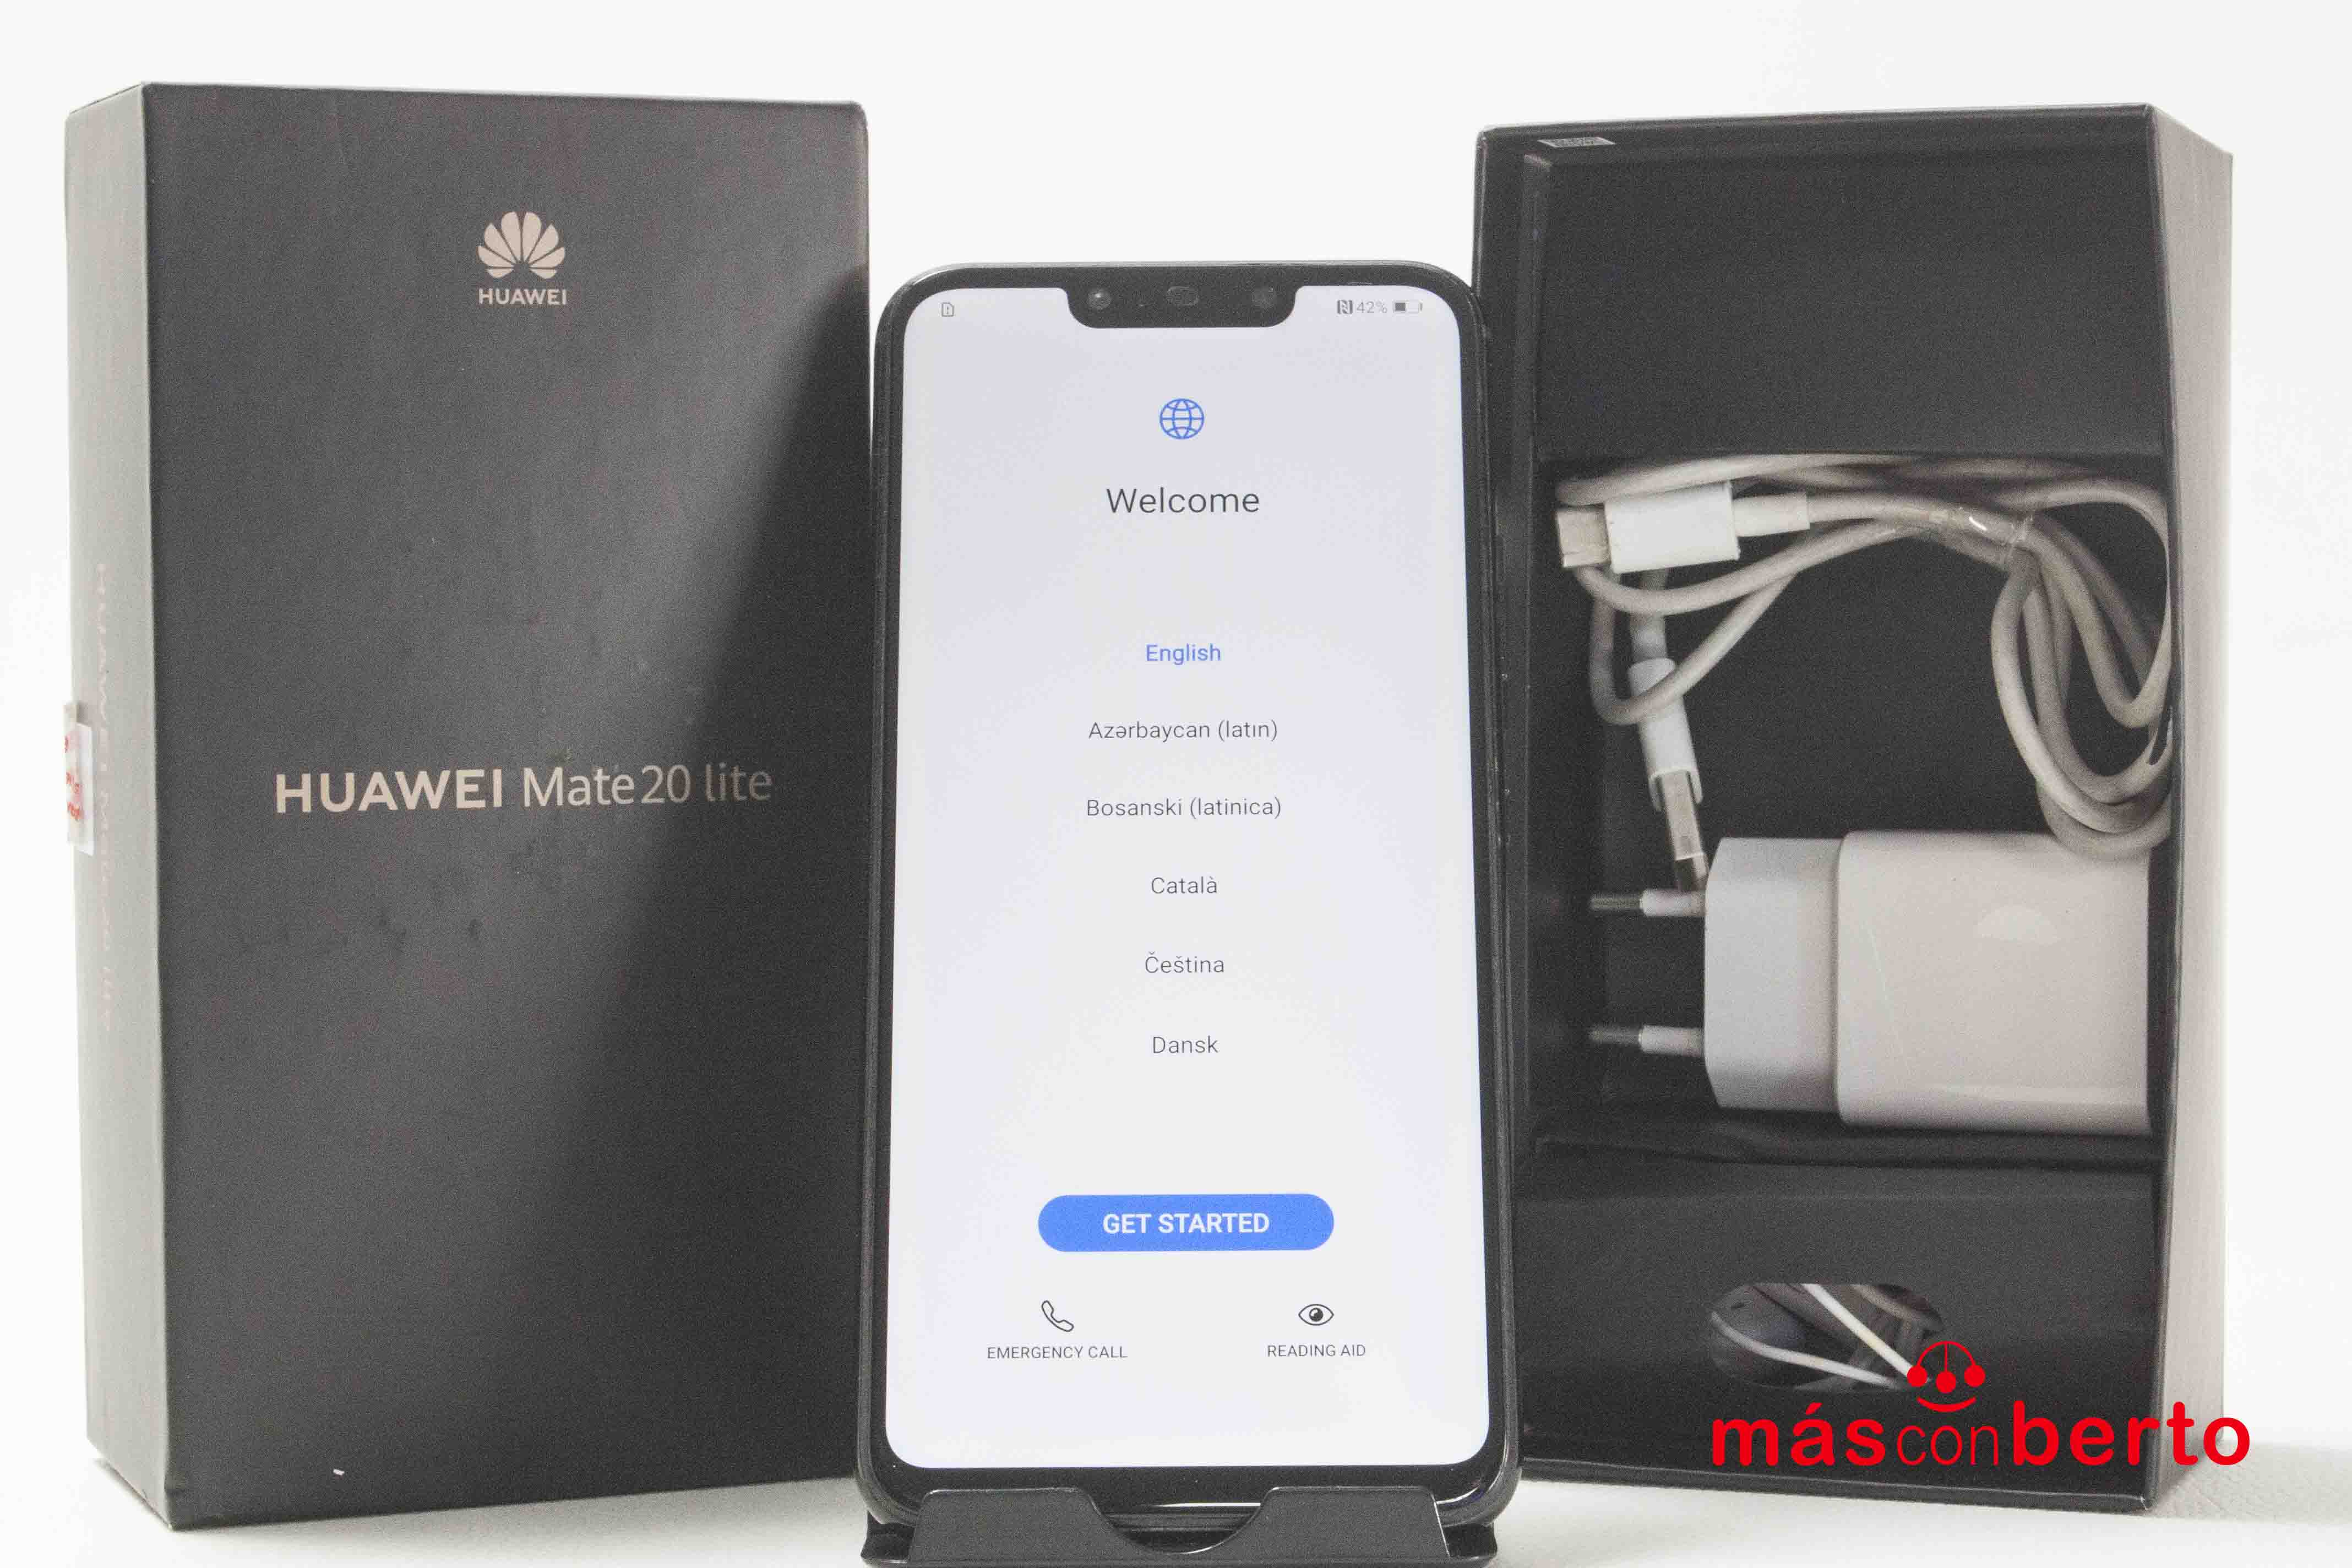 Móvil Huawei Mate 20 lite 64Gb